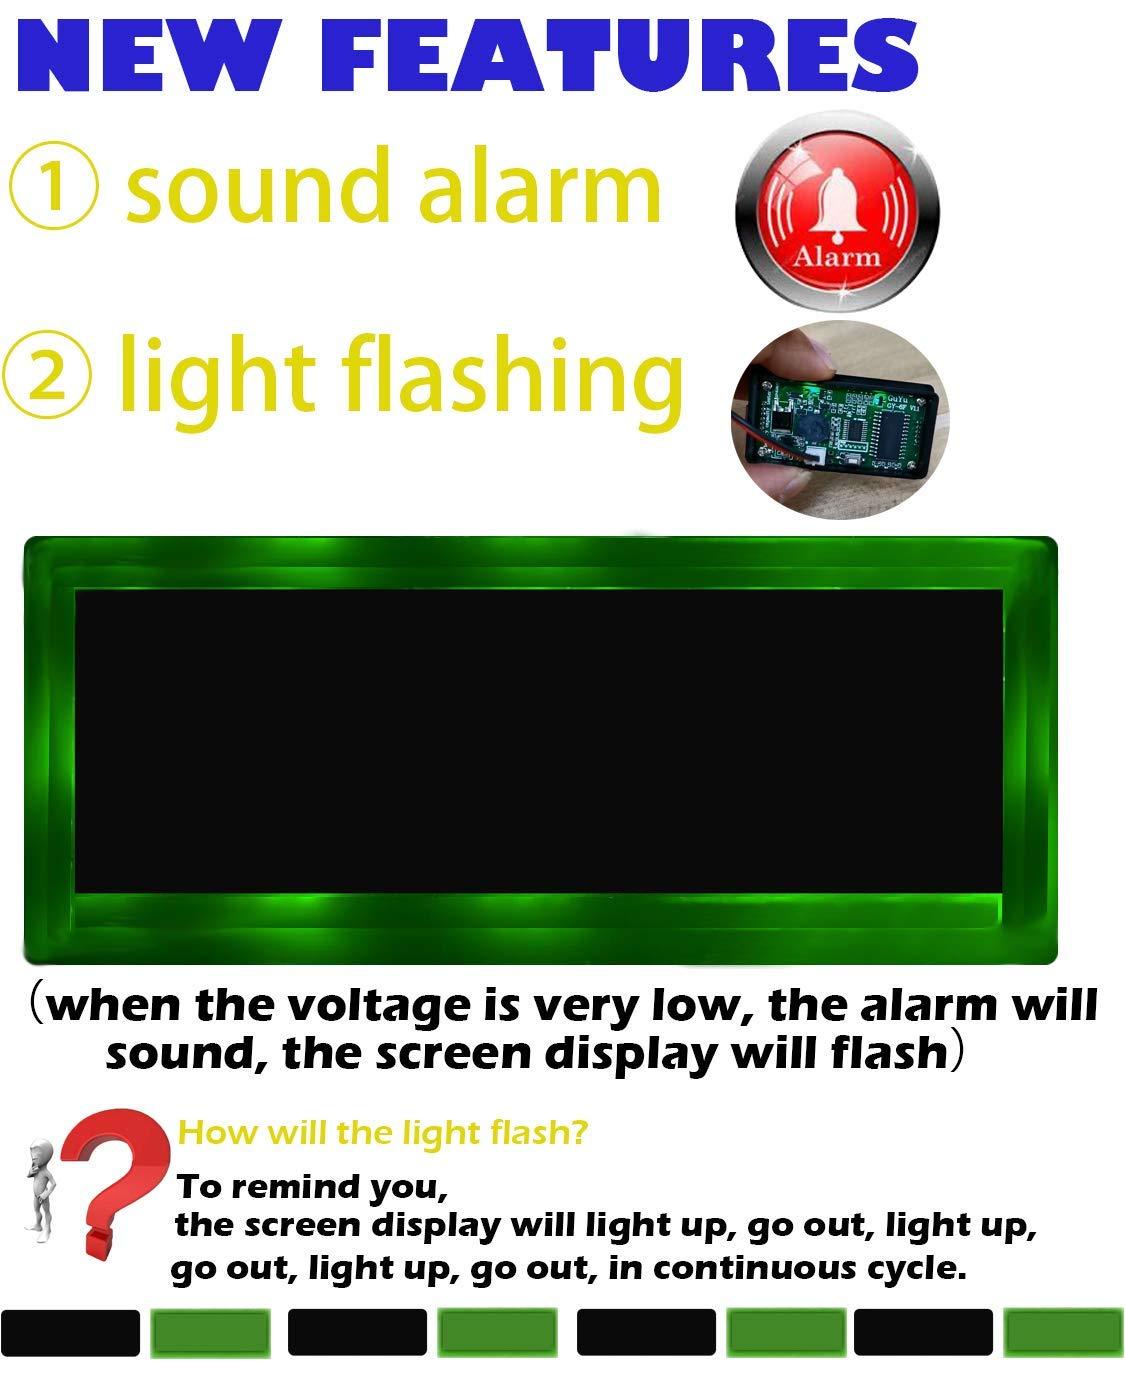 multifunktional cleanpower Alarm 12 V Kapazit/ät LCD-Anzeige f/ür Blei-S/äure-Batterie